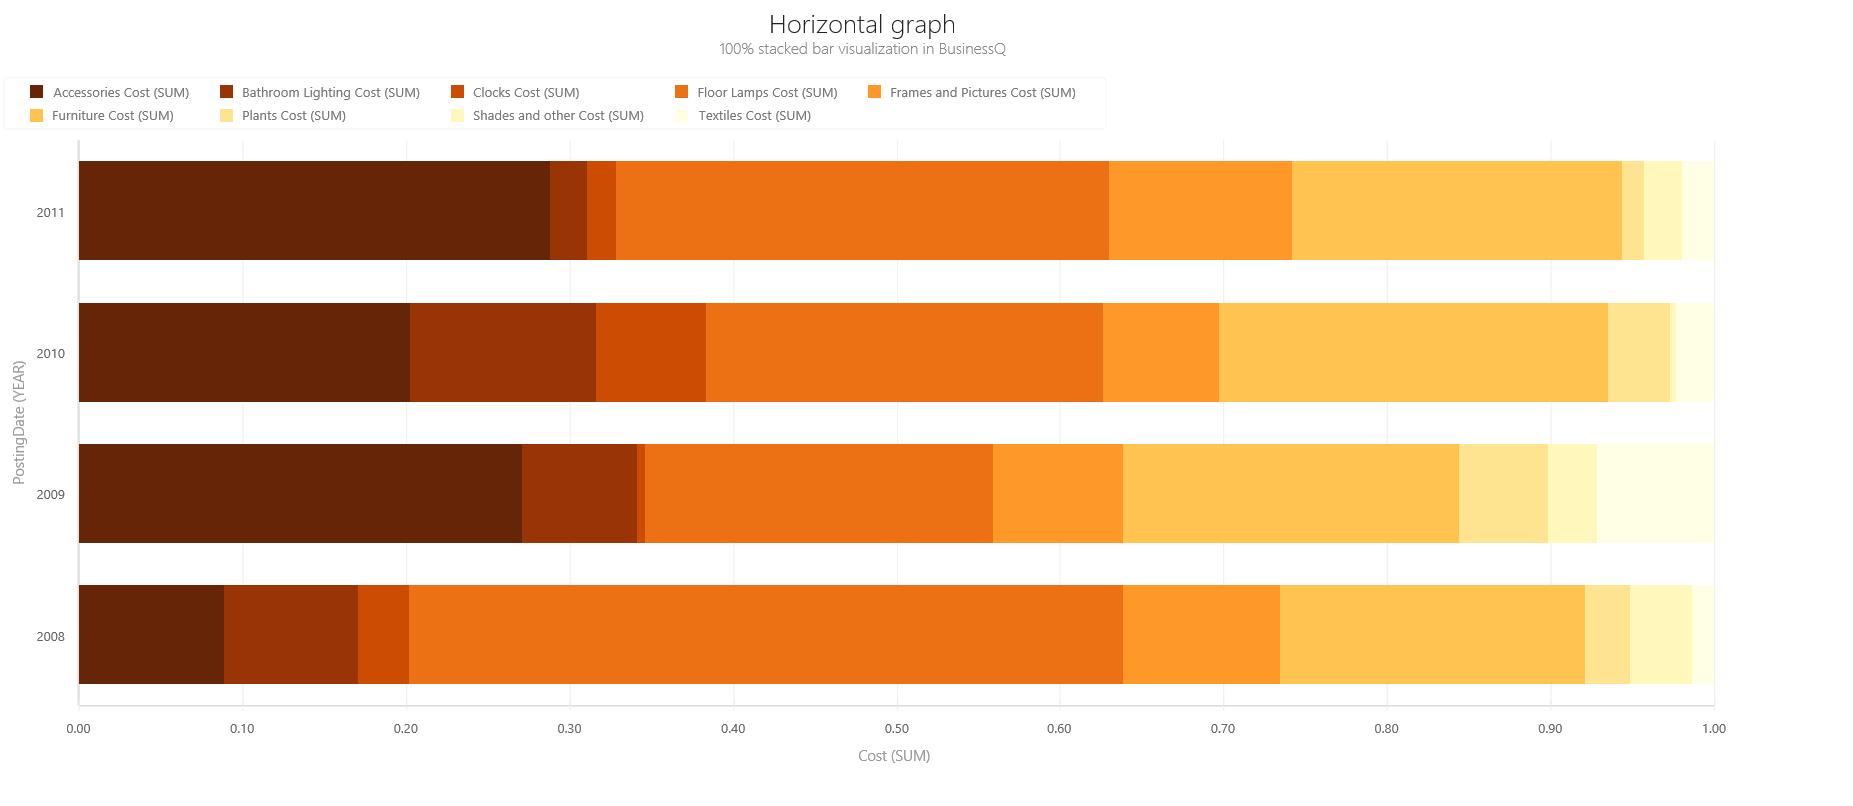 BQ_Horizontal_graph_2_Hotizontal_100%_Stacked_Bar